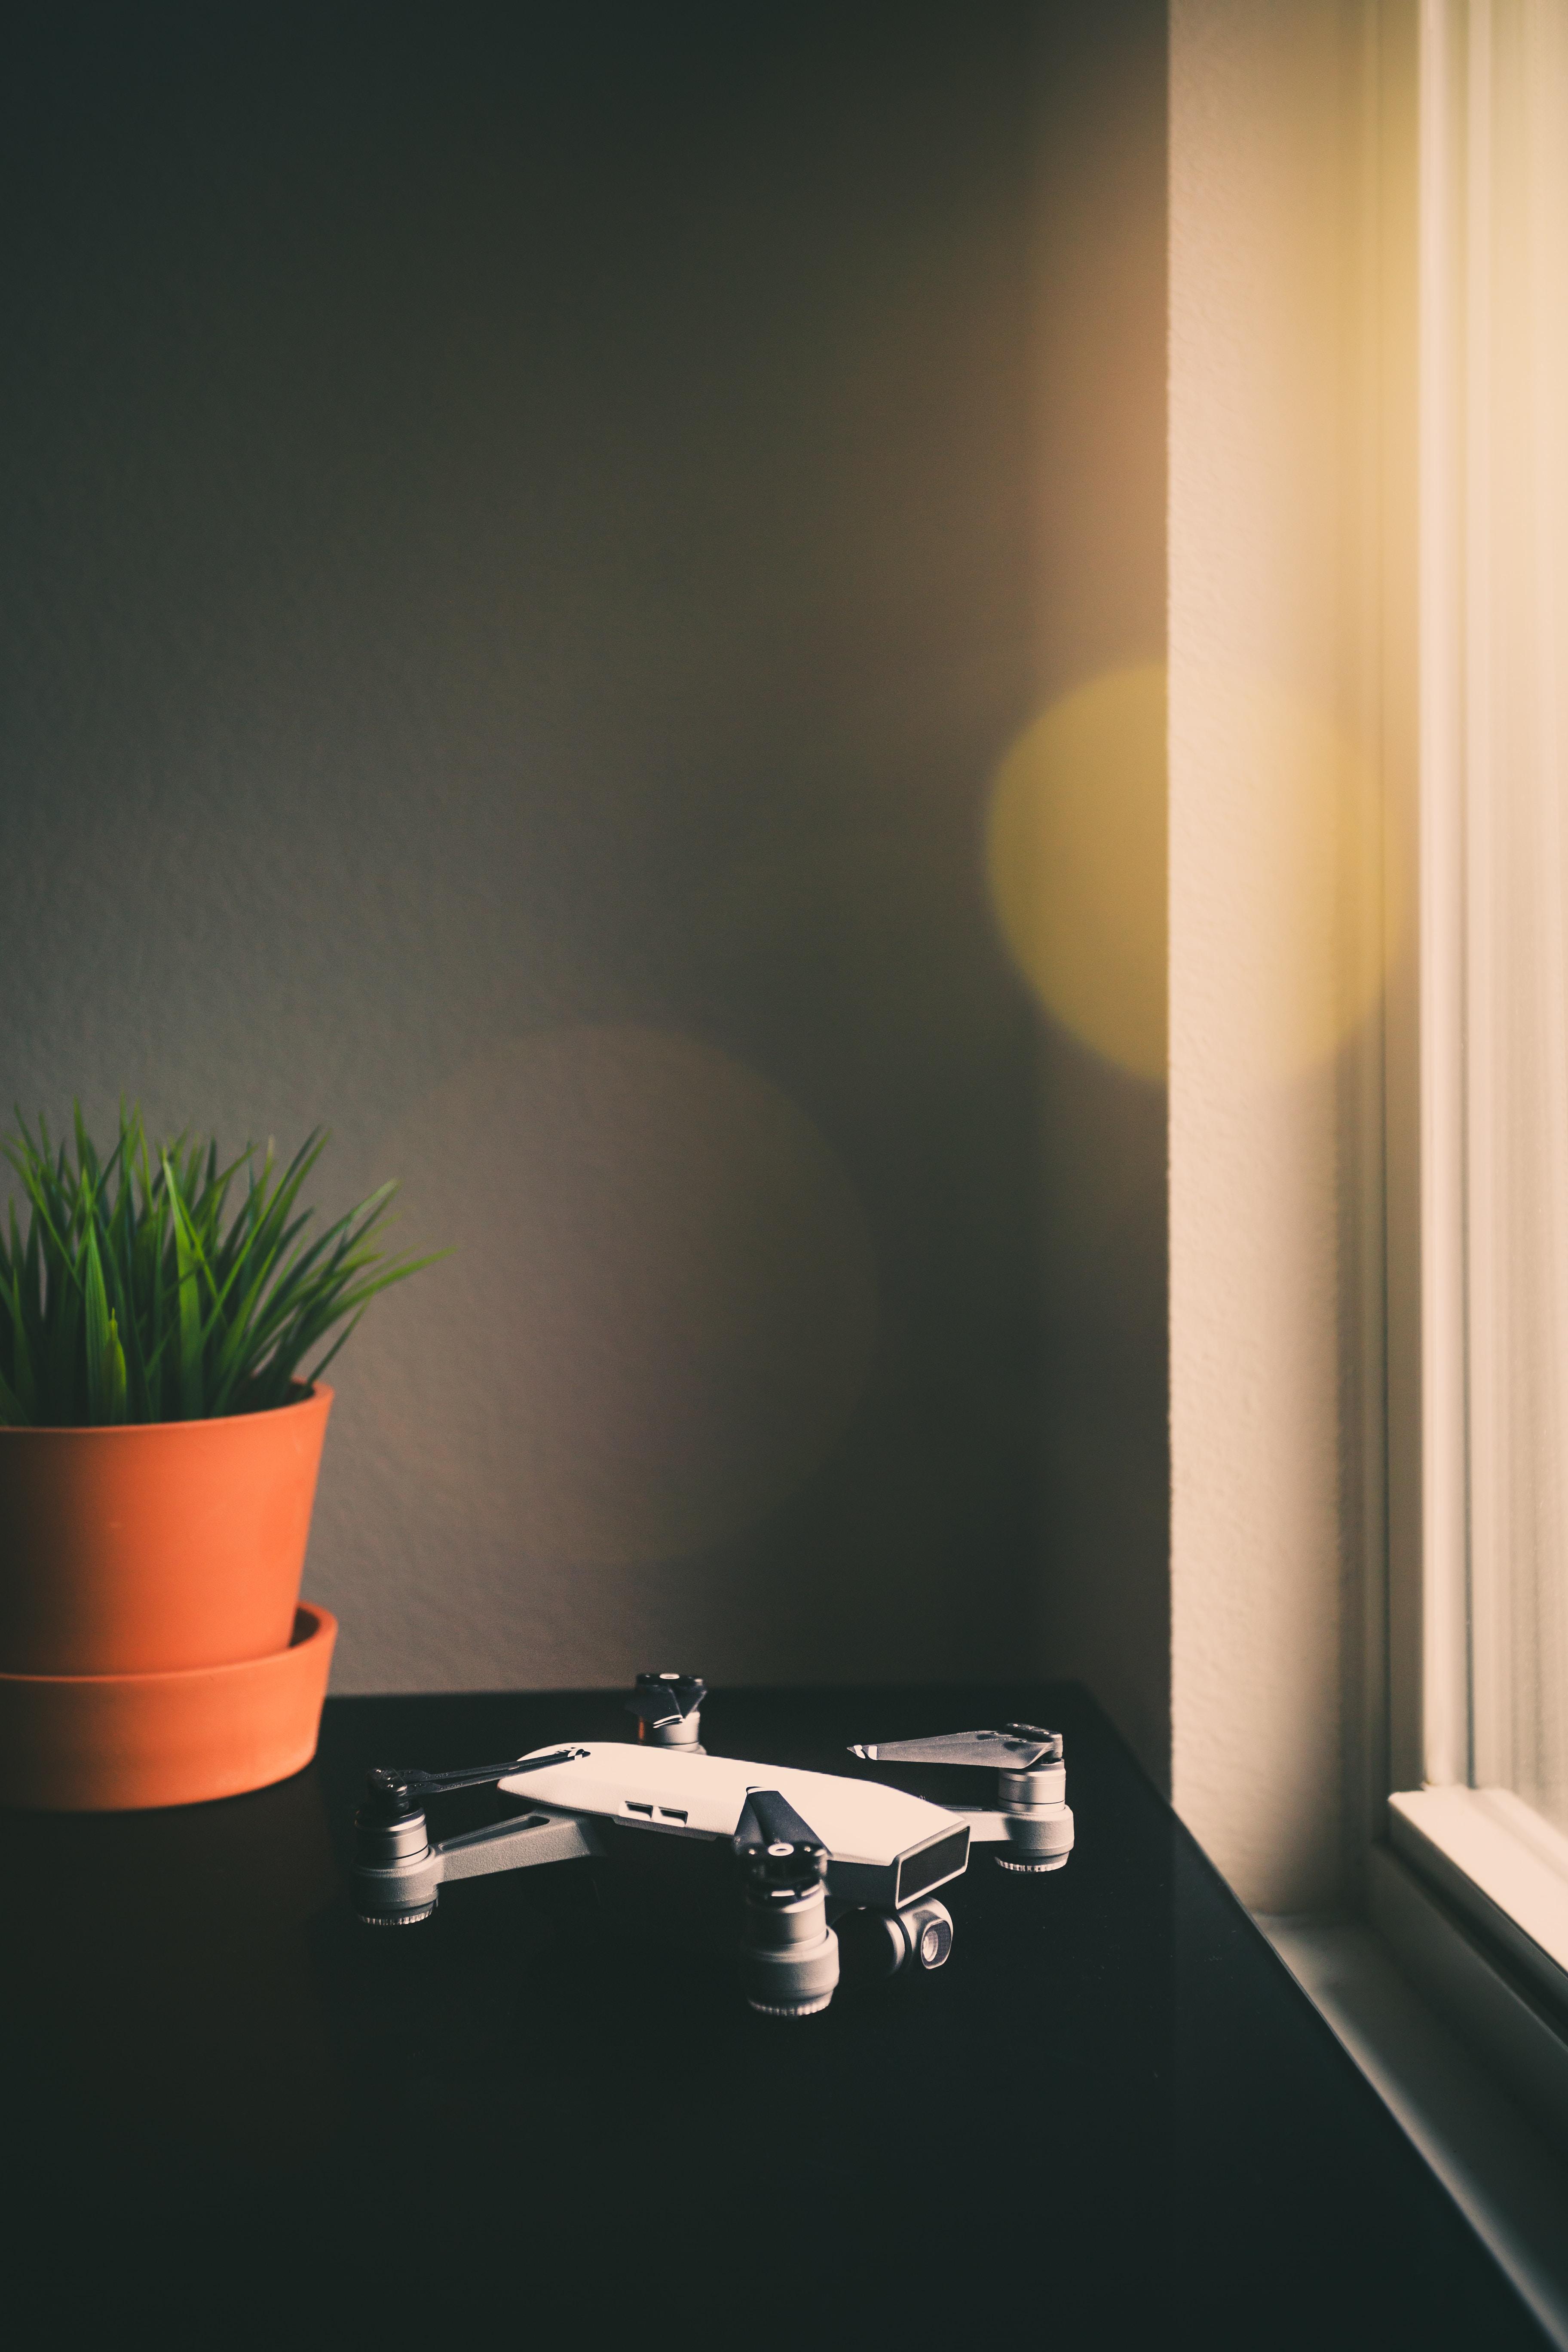 white and black DJI Mavic drone on table